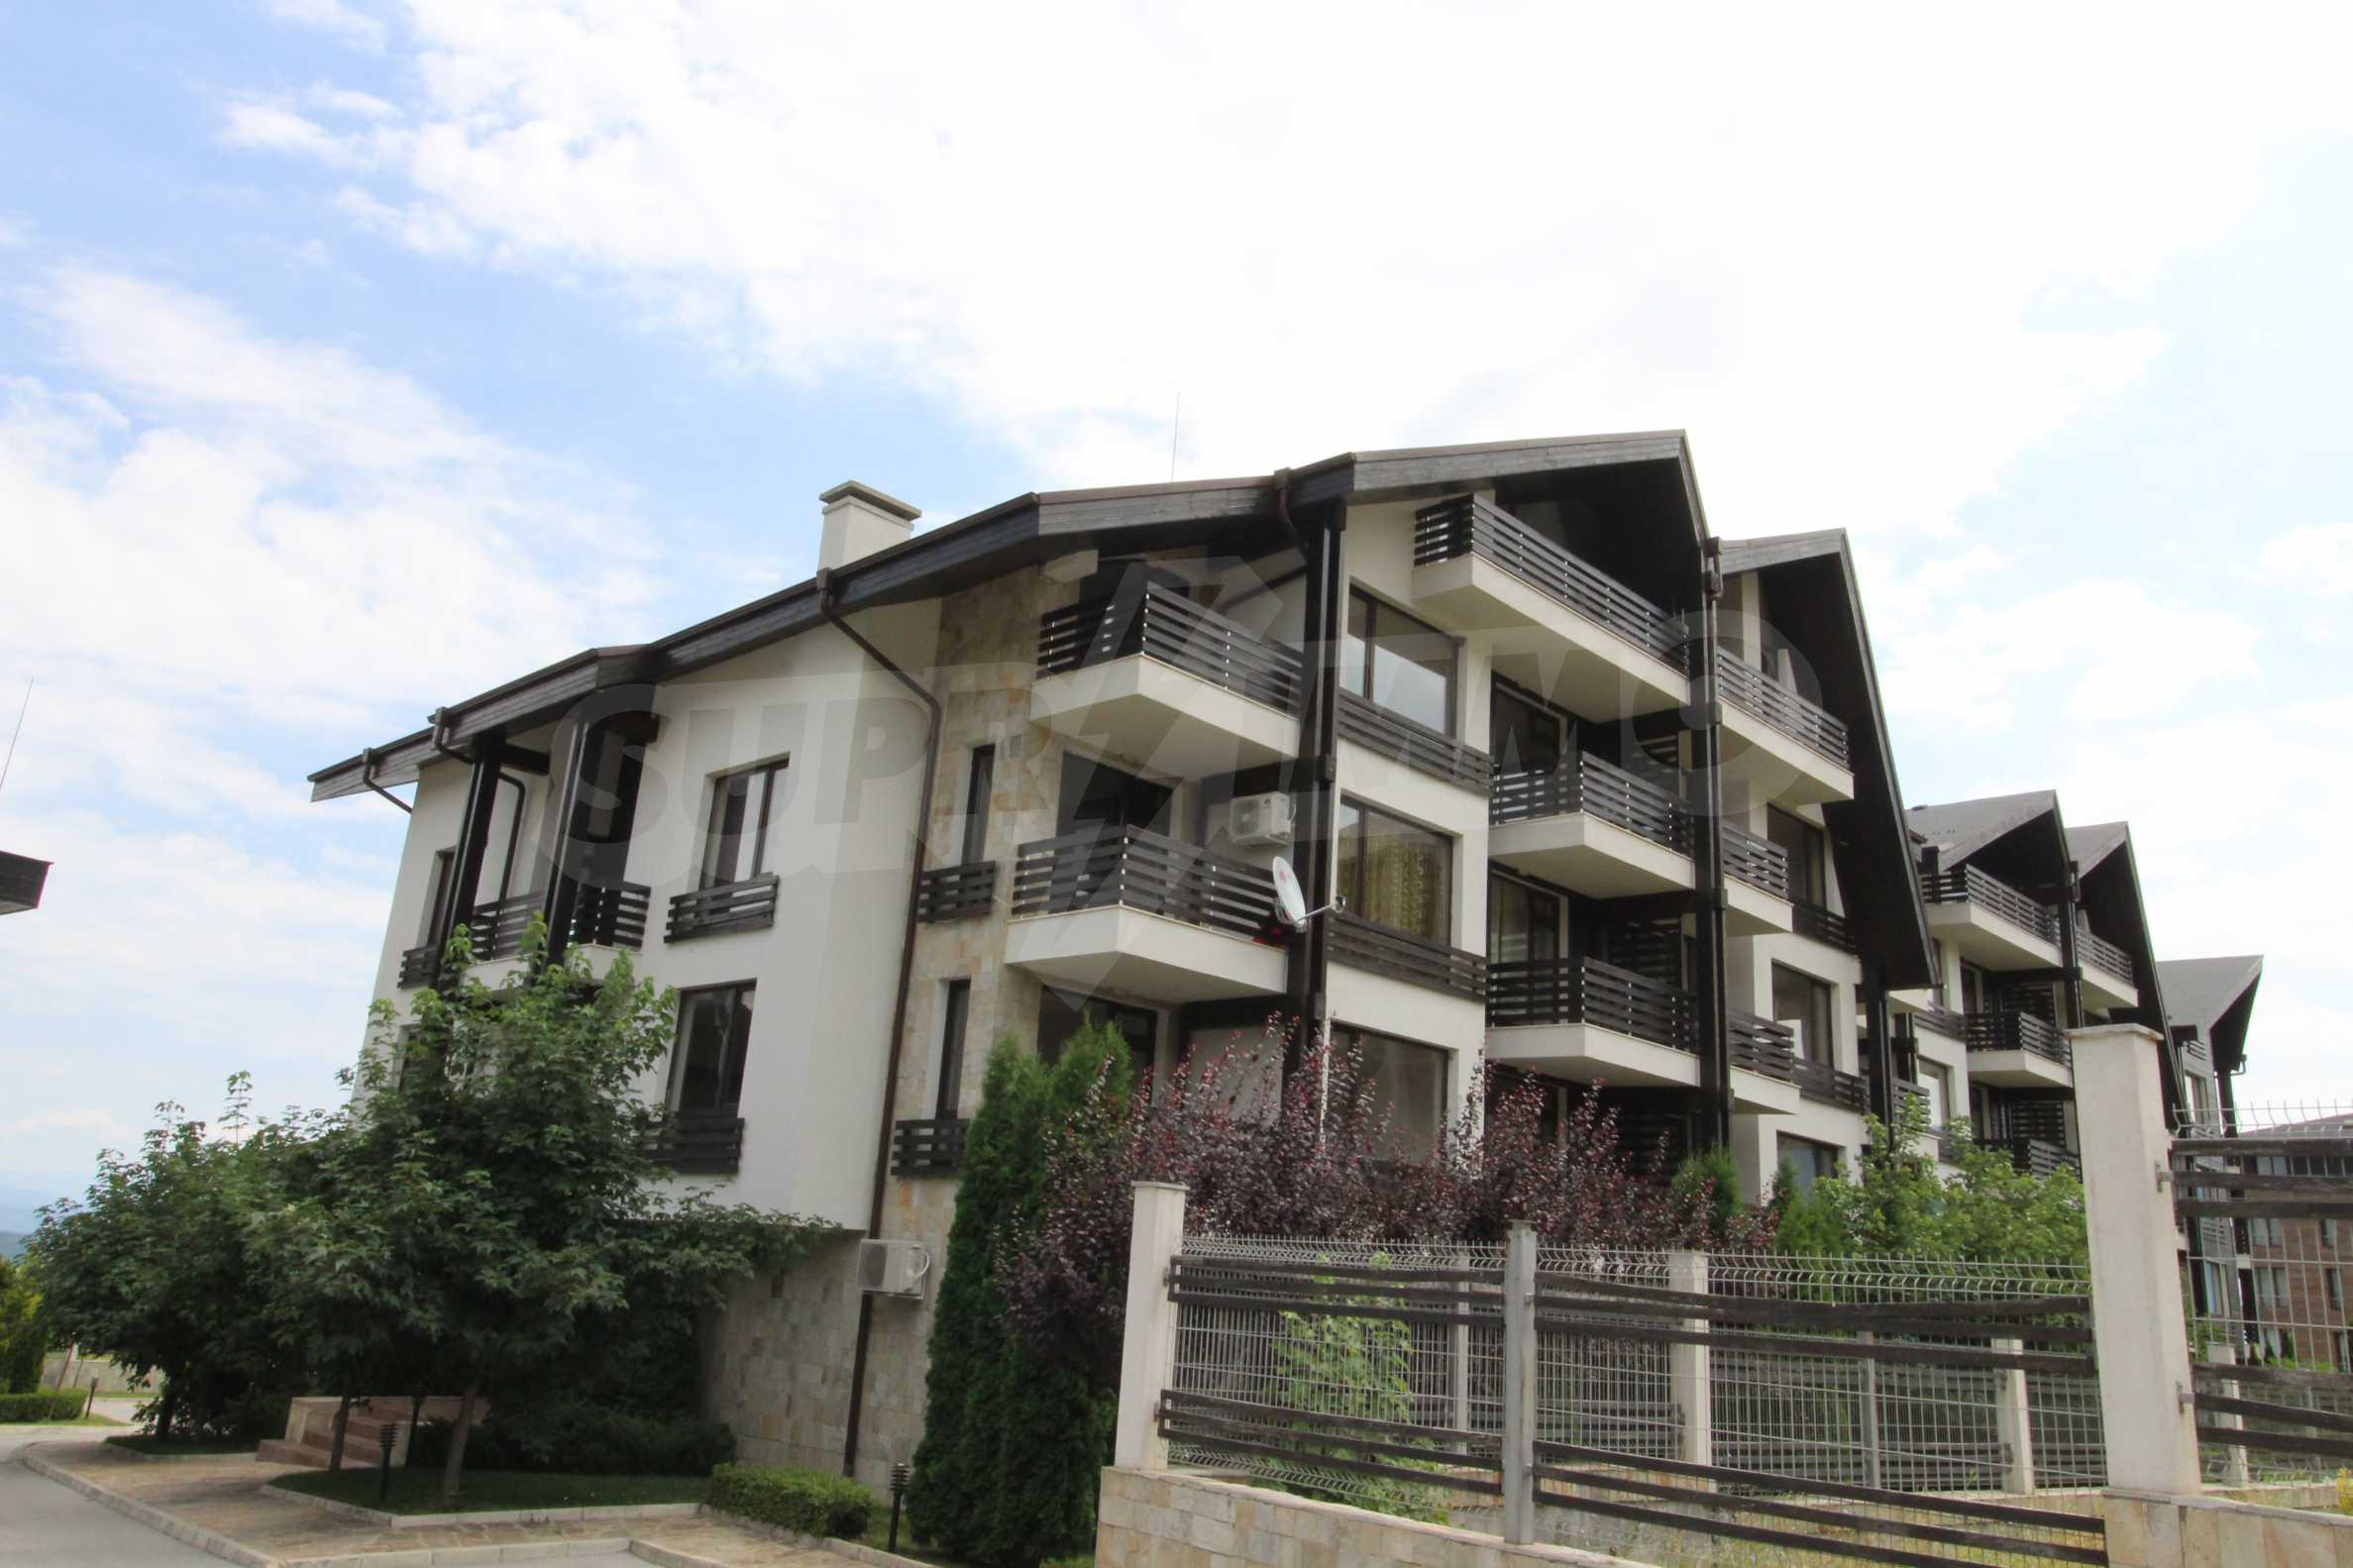 Стилен апартамент в близост до ски курорта Банско 2